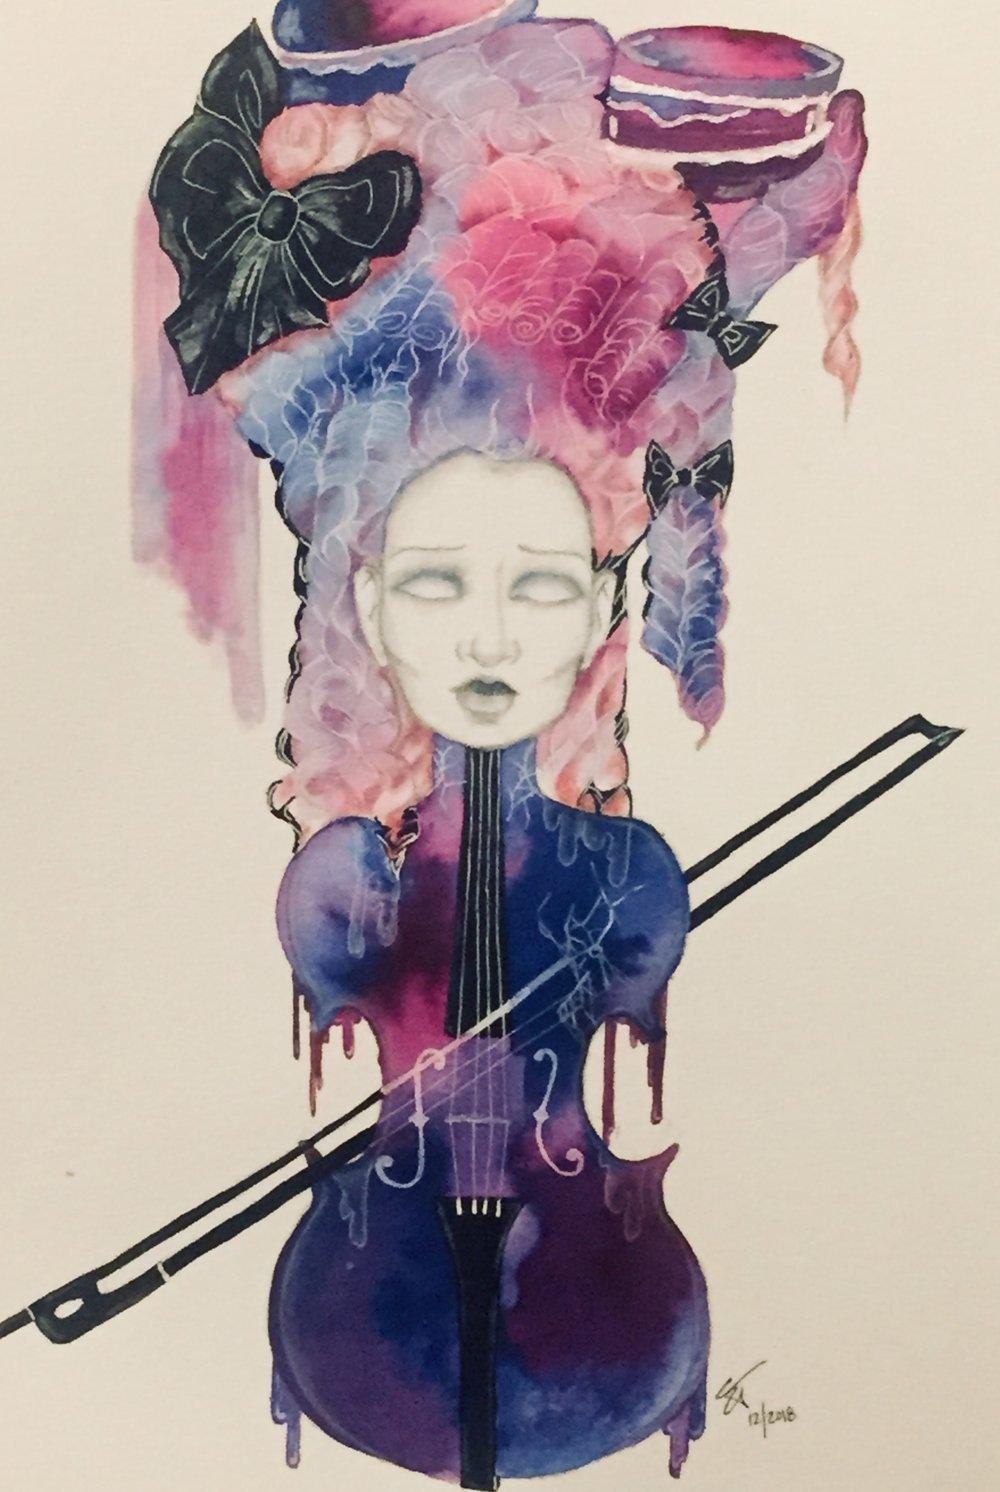 Vivaldi's Meloncholy, 2018